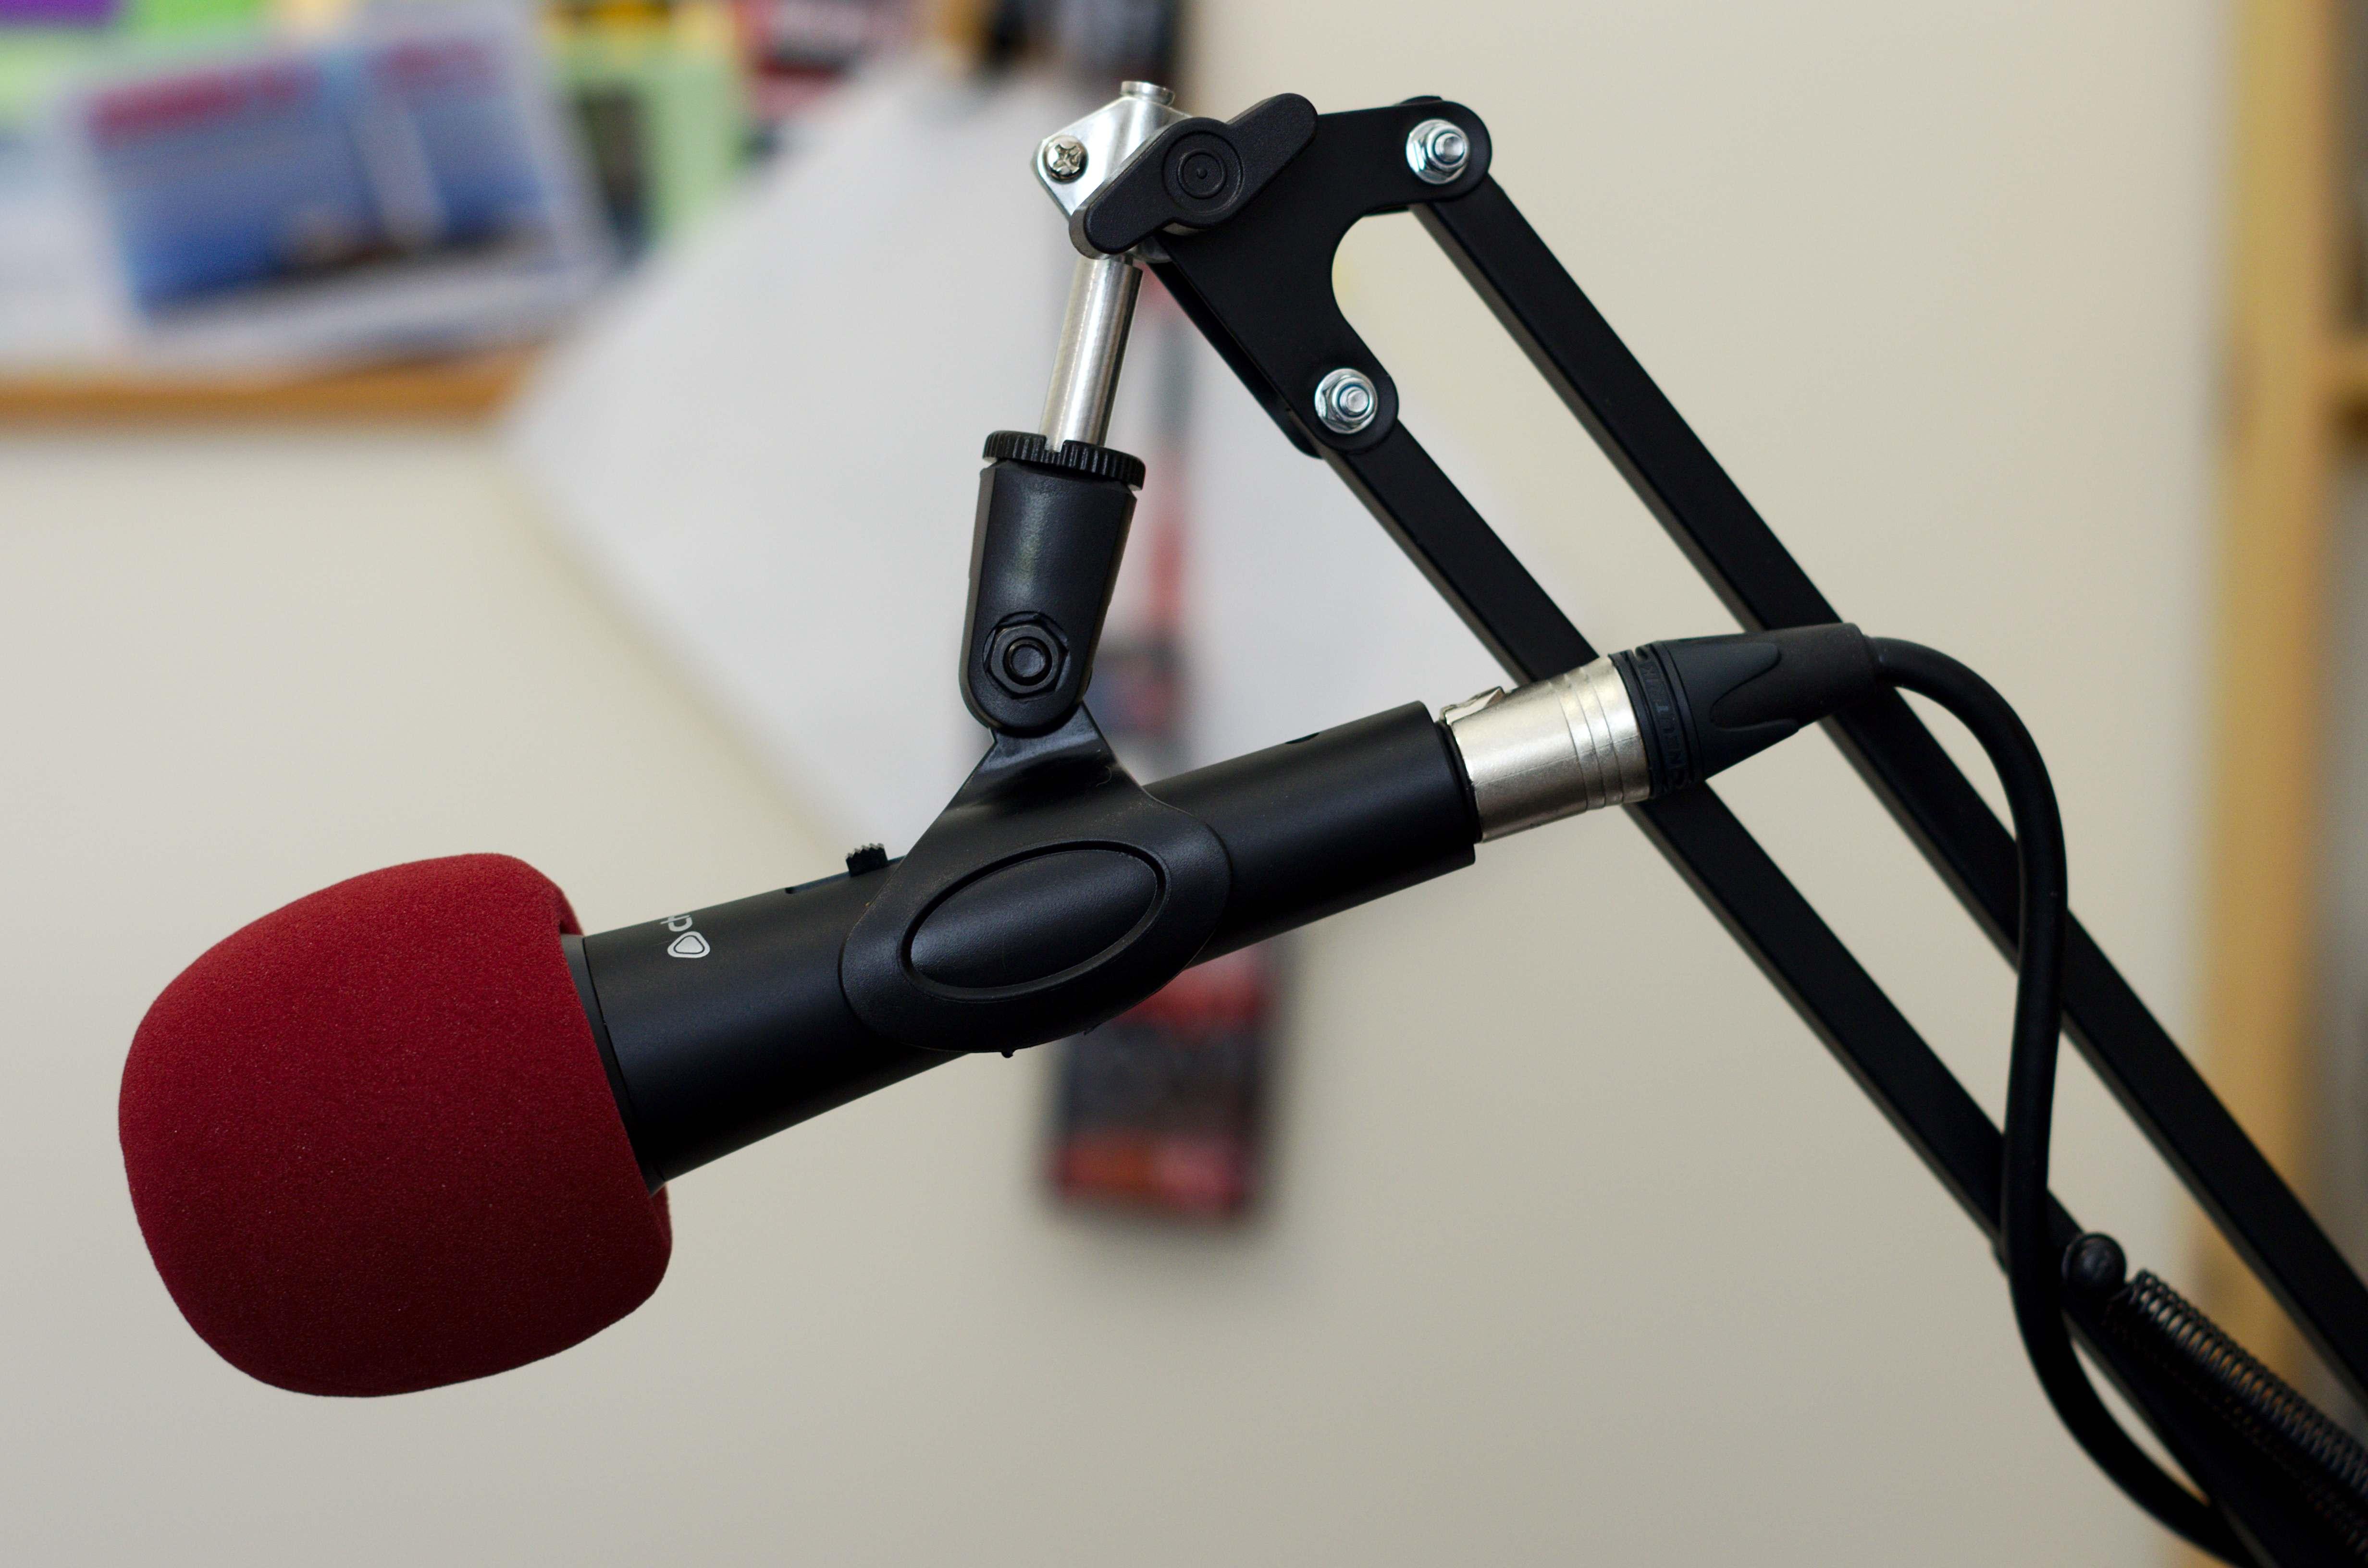 Upgrade: Yaesu MH-31 to Studio Mic | M0SPN / OH3SPN on ft-450 yaesu mic wiring diagram, 4 pin din diagram, yaesu md 1 wiring, yaesu ft 7800 mic wiring, yaesu mic pinout, yaesu ft 920 microphone, yaesu ft 1000 microphone wire, headphone jack wiring diagram, yaesu md 100 microphone manual, yaesu microphone cable, yaesu ft-920 hidden menu, cobra 4 pin wiring diagram, astatic mic wiring diagram, yaesu ptt schematics, yaesu microphone parts,